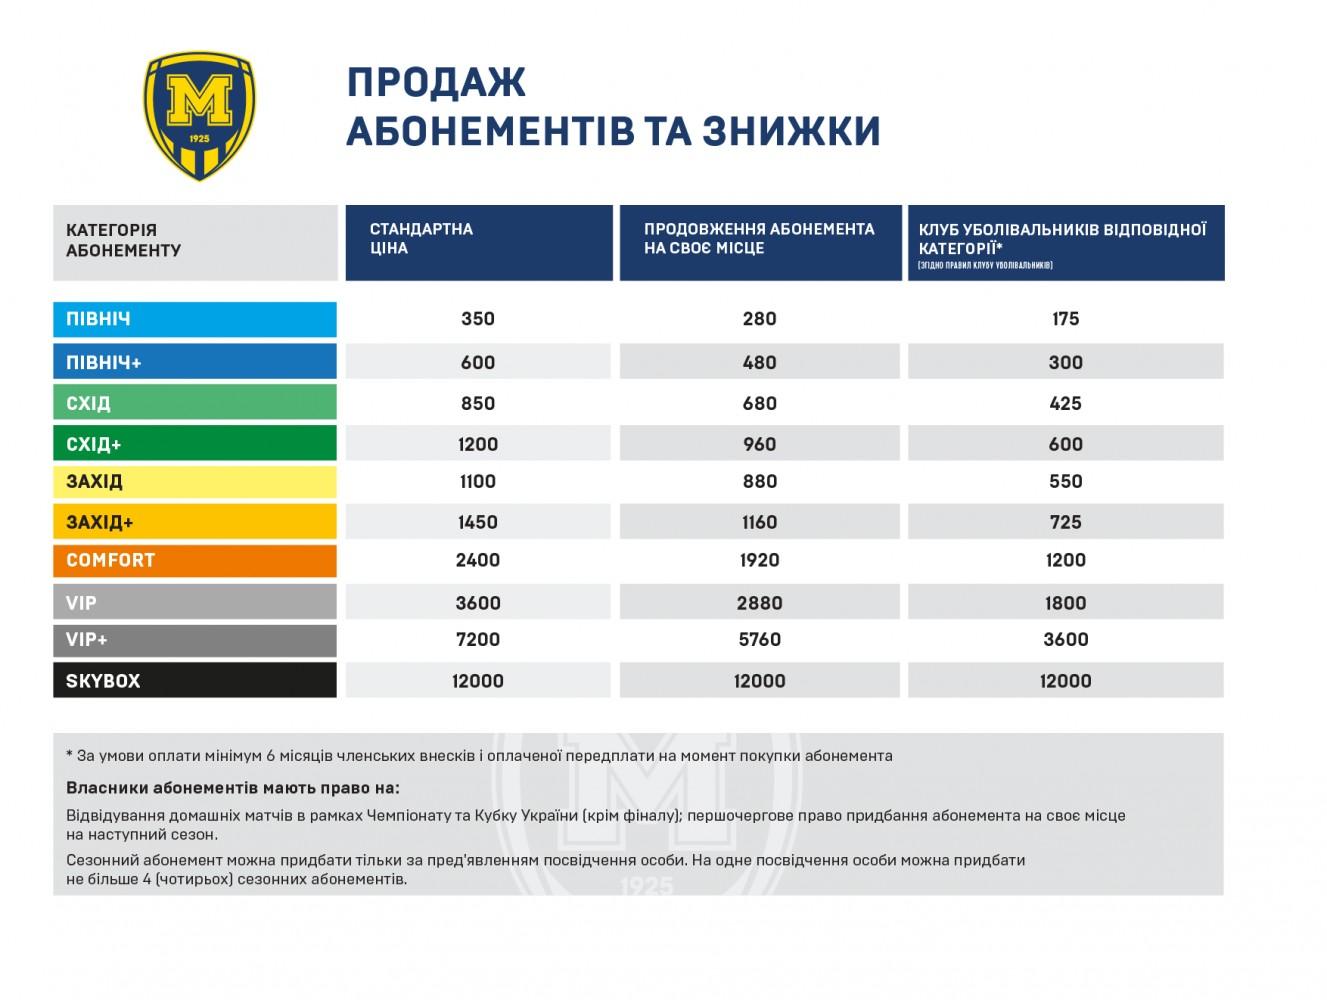 Продажа абонементов ФК Металлист 1925